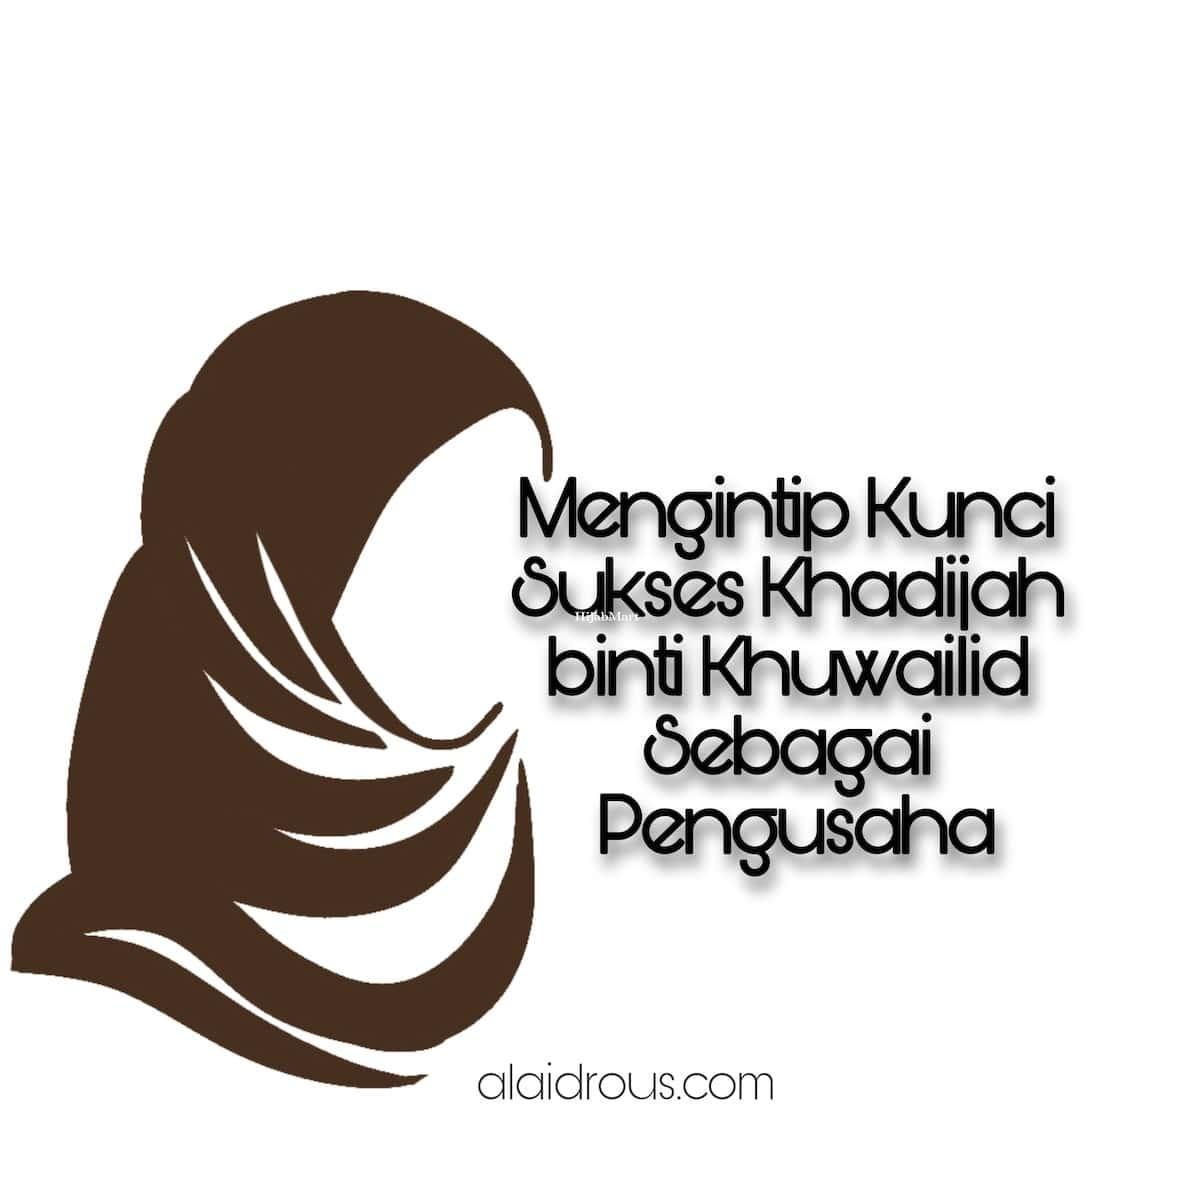 Mengintip Kunci Sukses Khadijah binti Kh,..